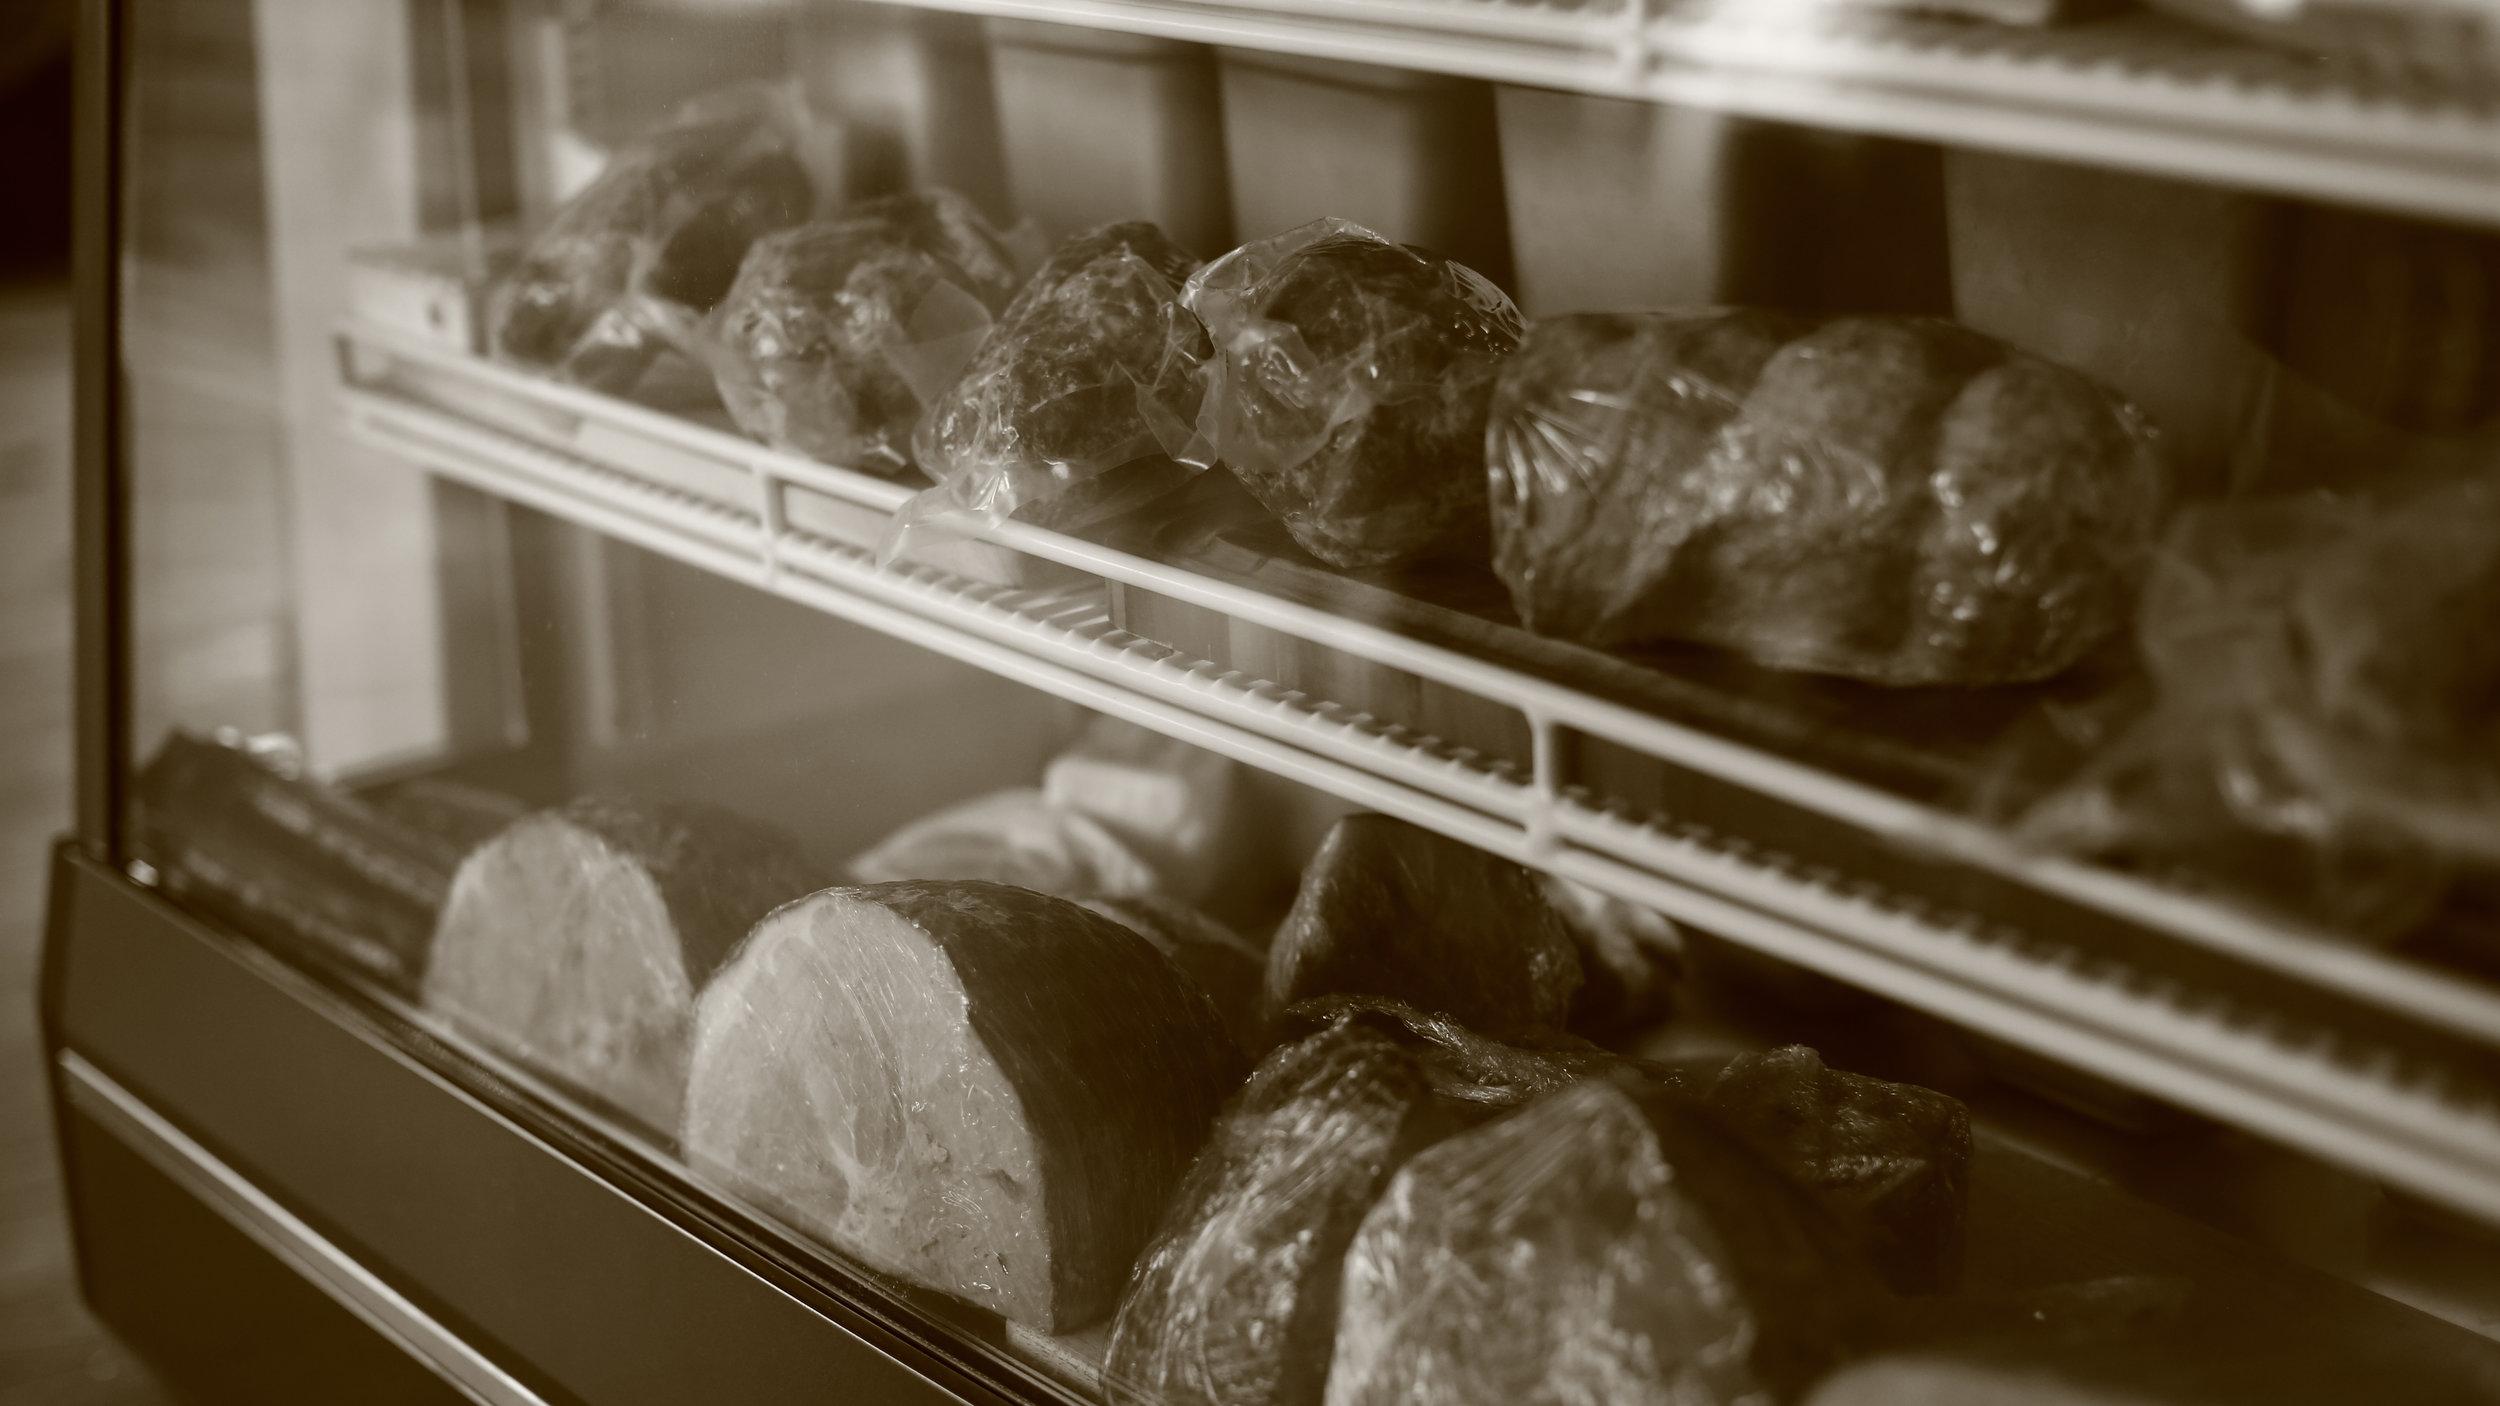 Local Hero Butchery Fare - Grass fed beef, bison, pork, lamb, chicken and rabbit. Your neighborhood butcher shoppe.